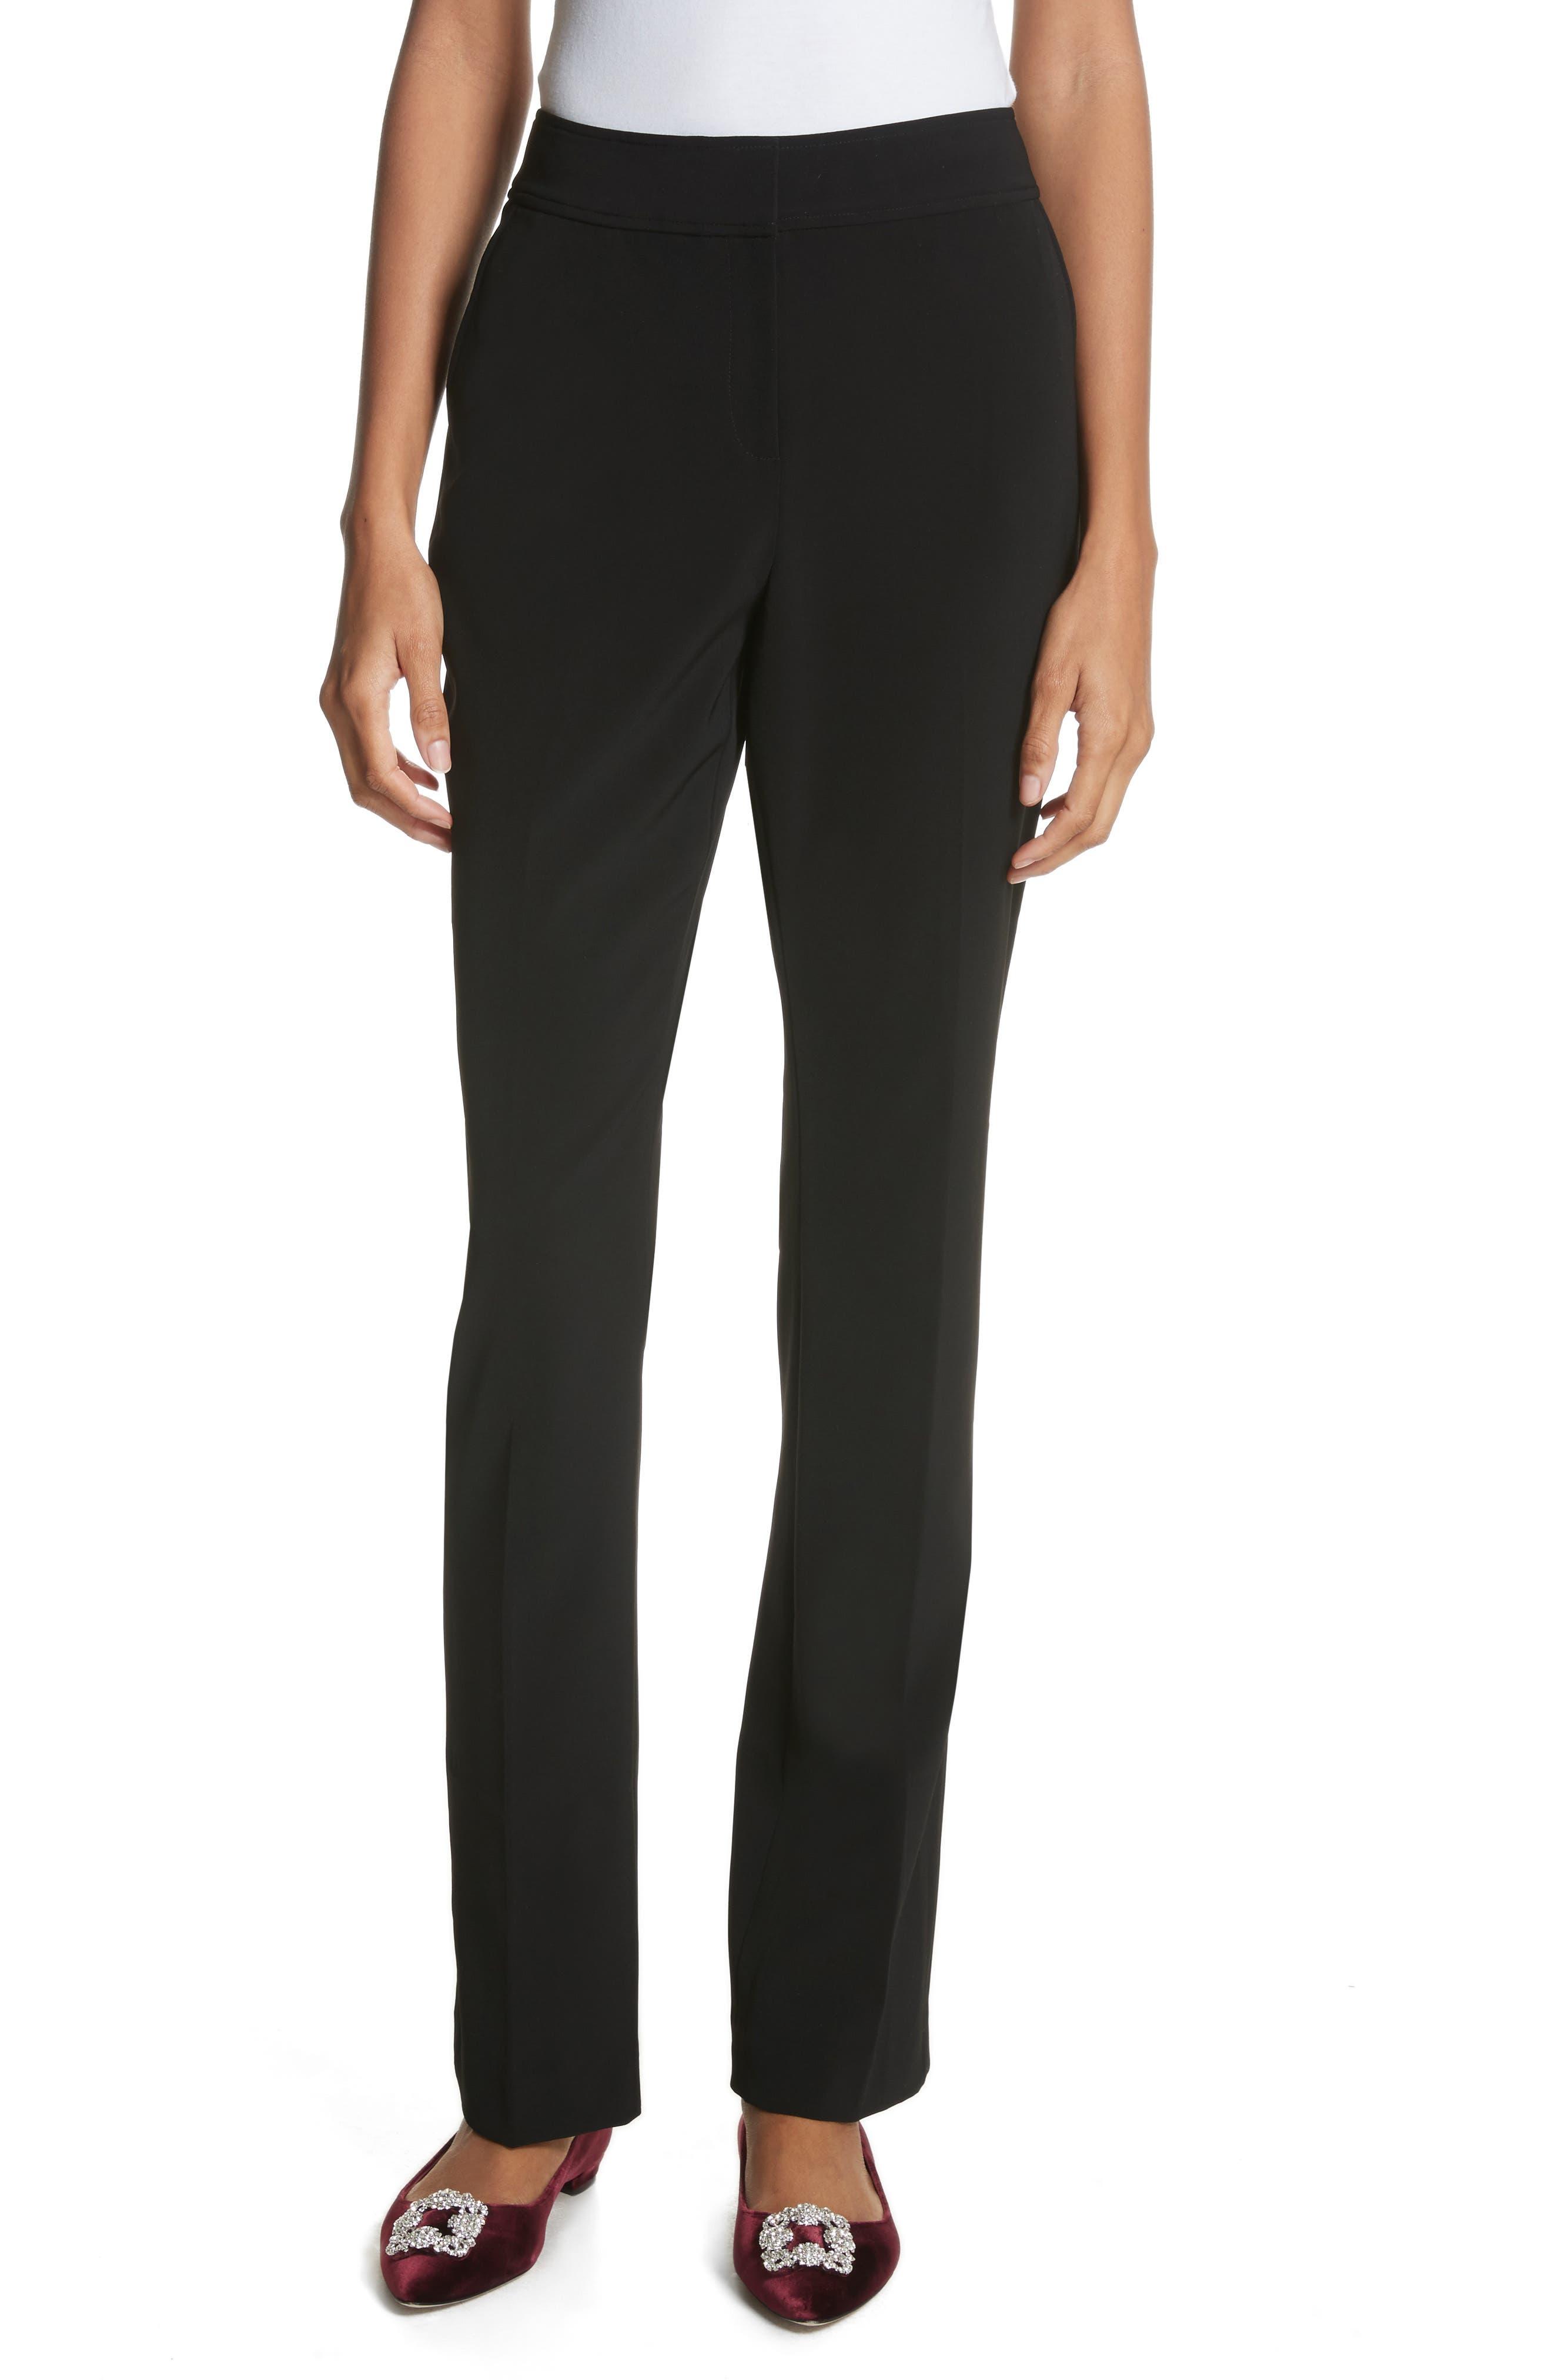 Yulit High Waist Trousers,                             Main thumbnail 1, color,                             001